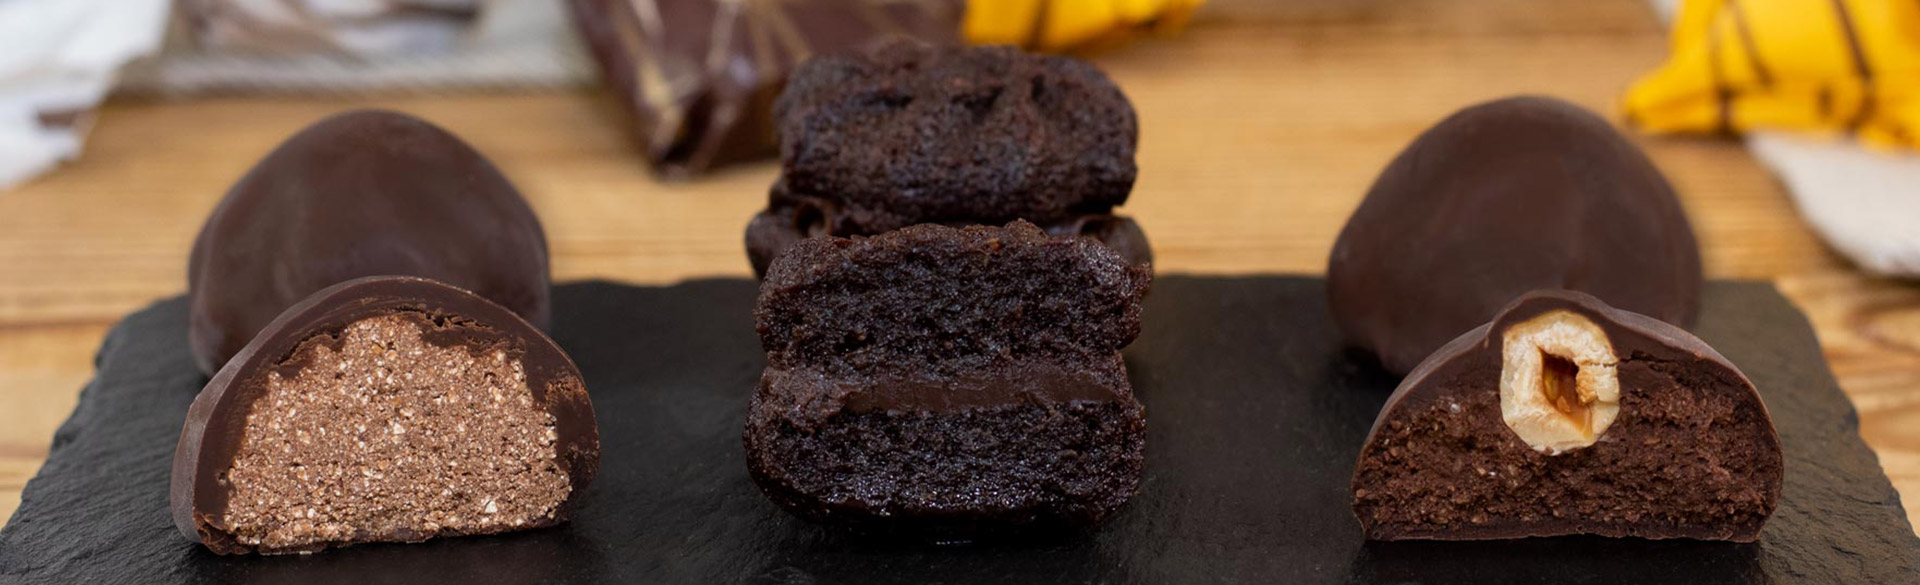 Cioccolato Torinese